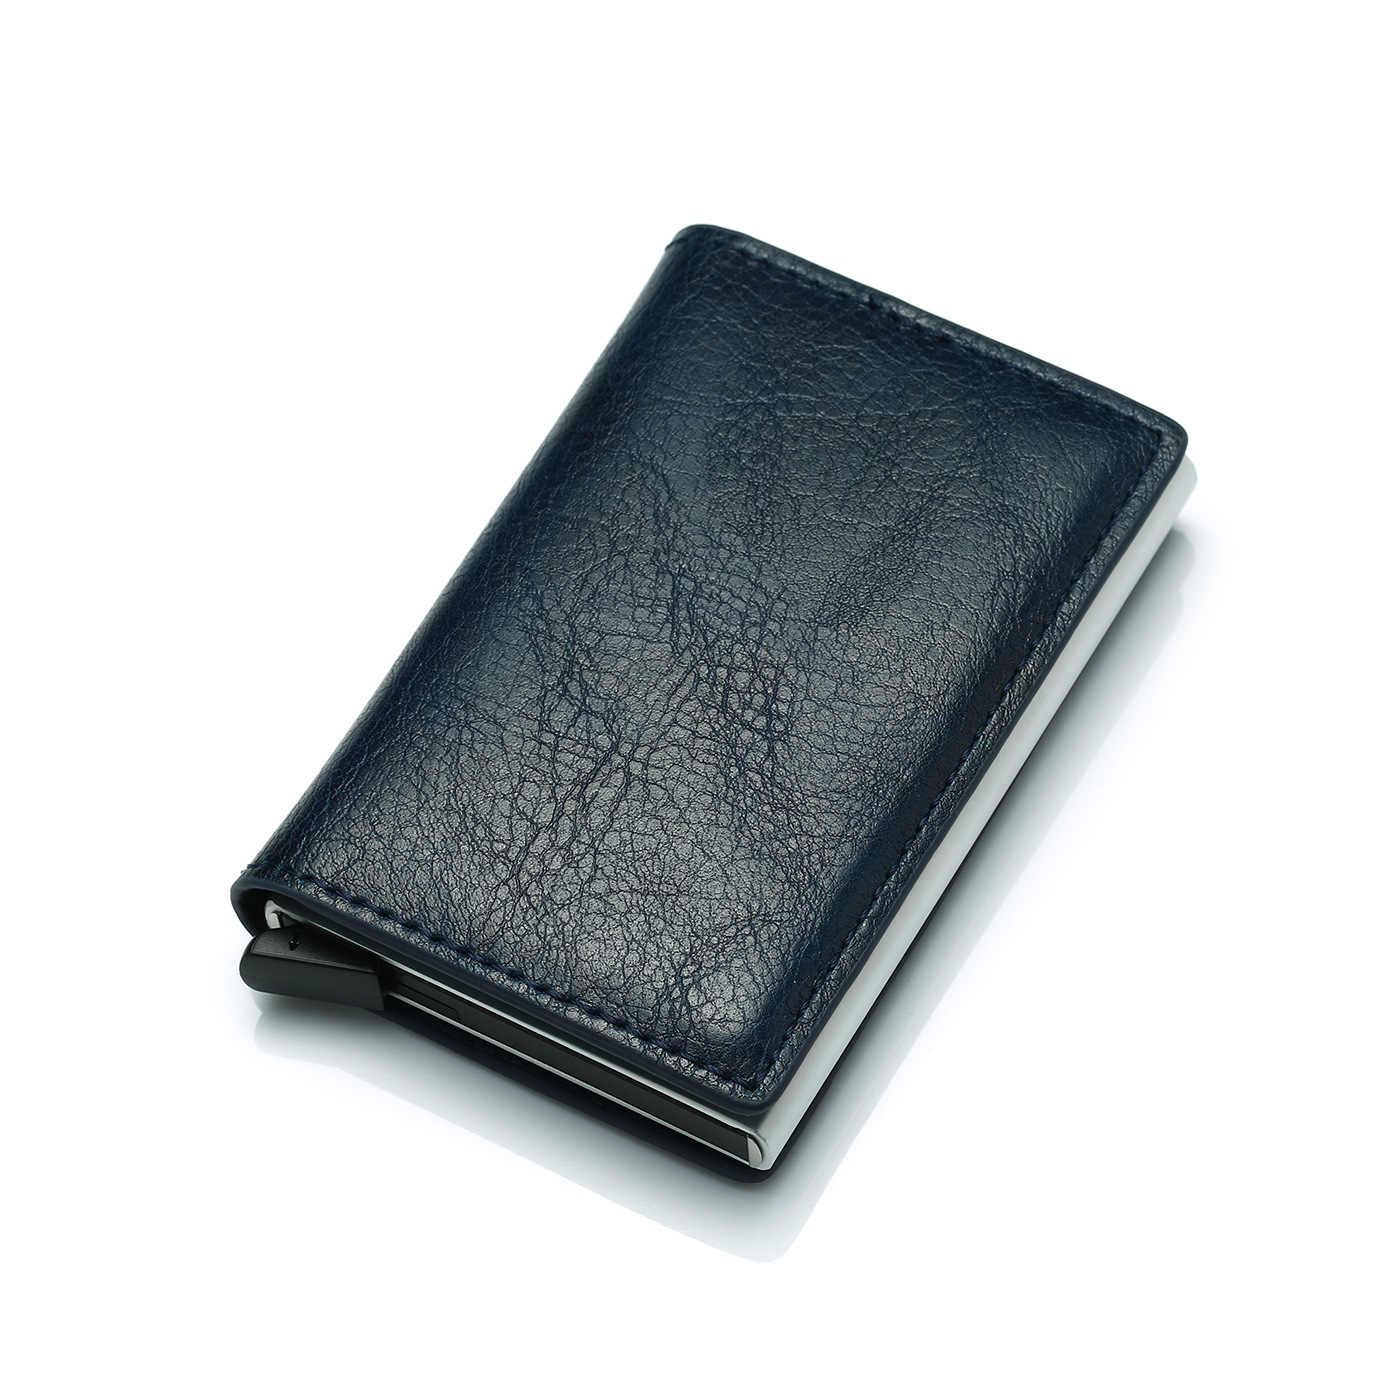 Anti id Credit Card Holder Rfid Blocking Wallet Leather Cardholder Security Aluminum Metal Purse creditcard holder Case